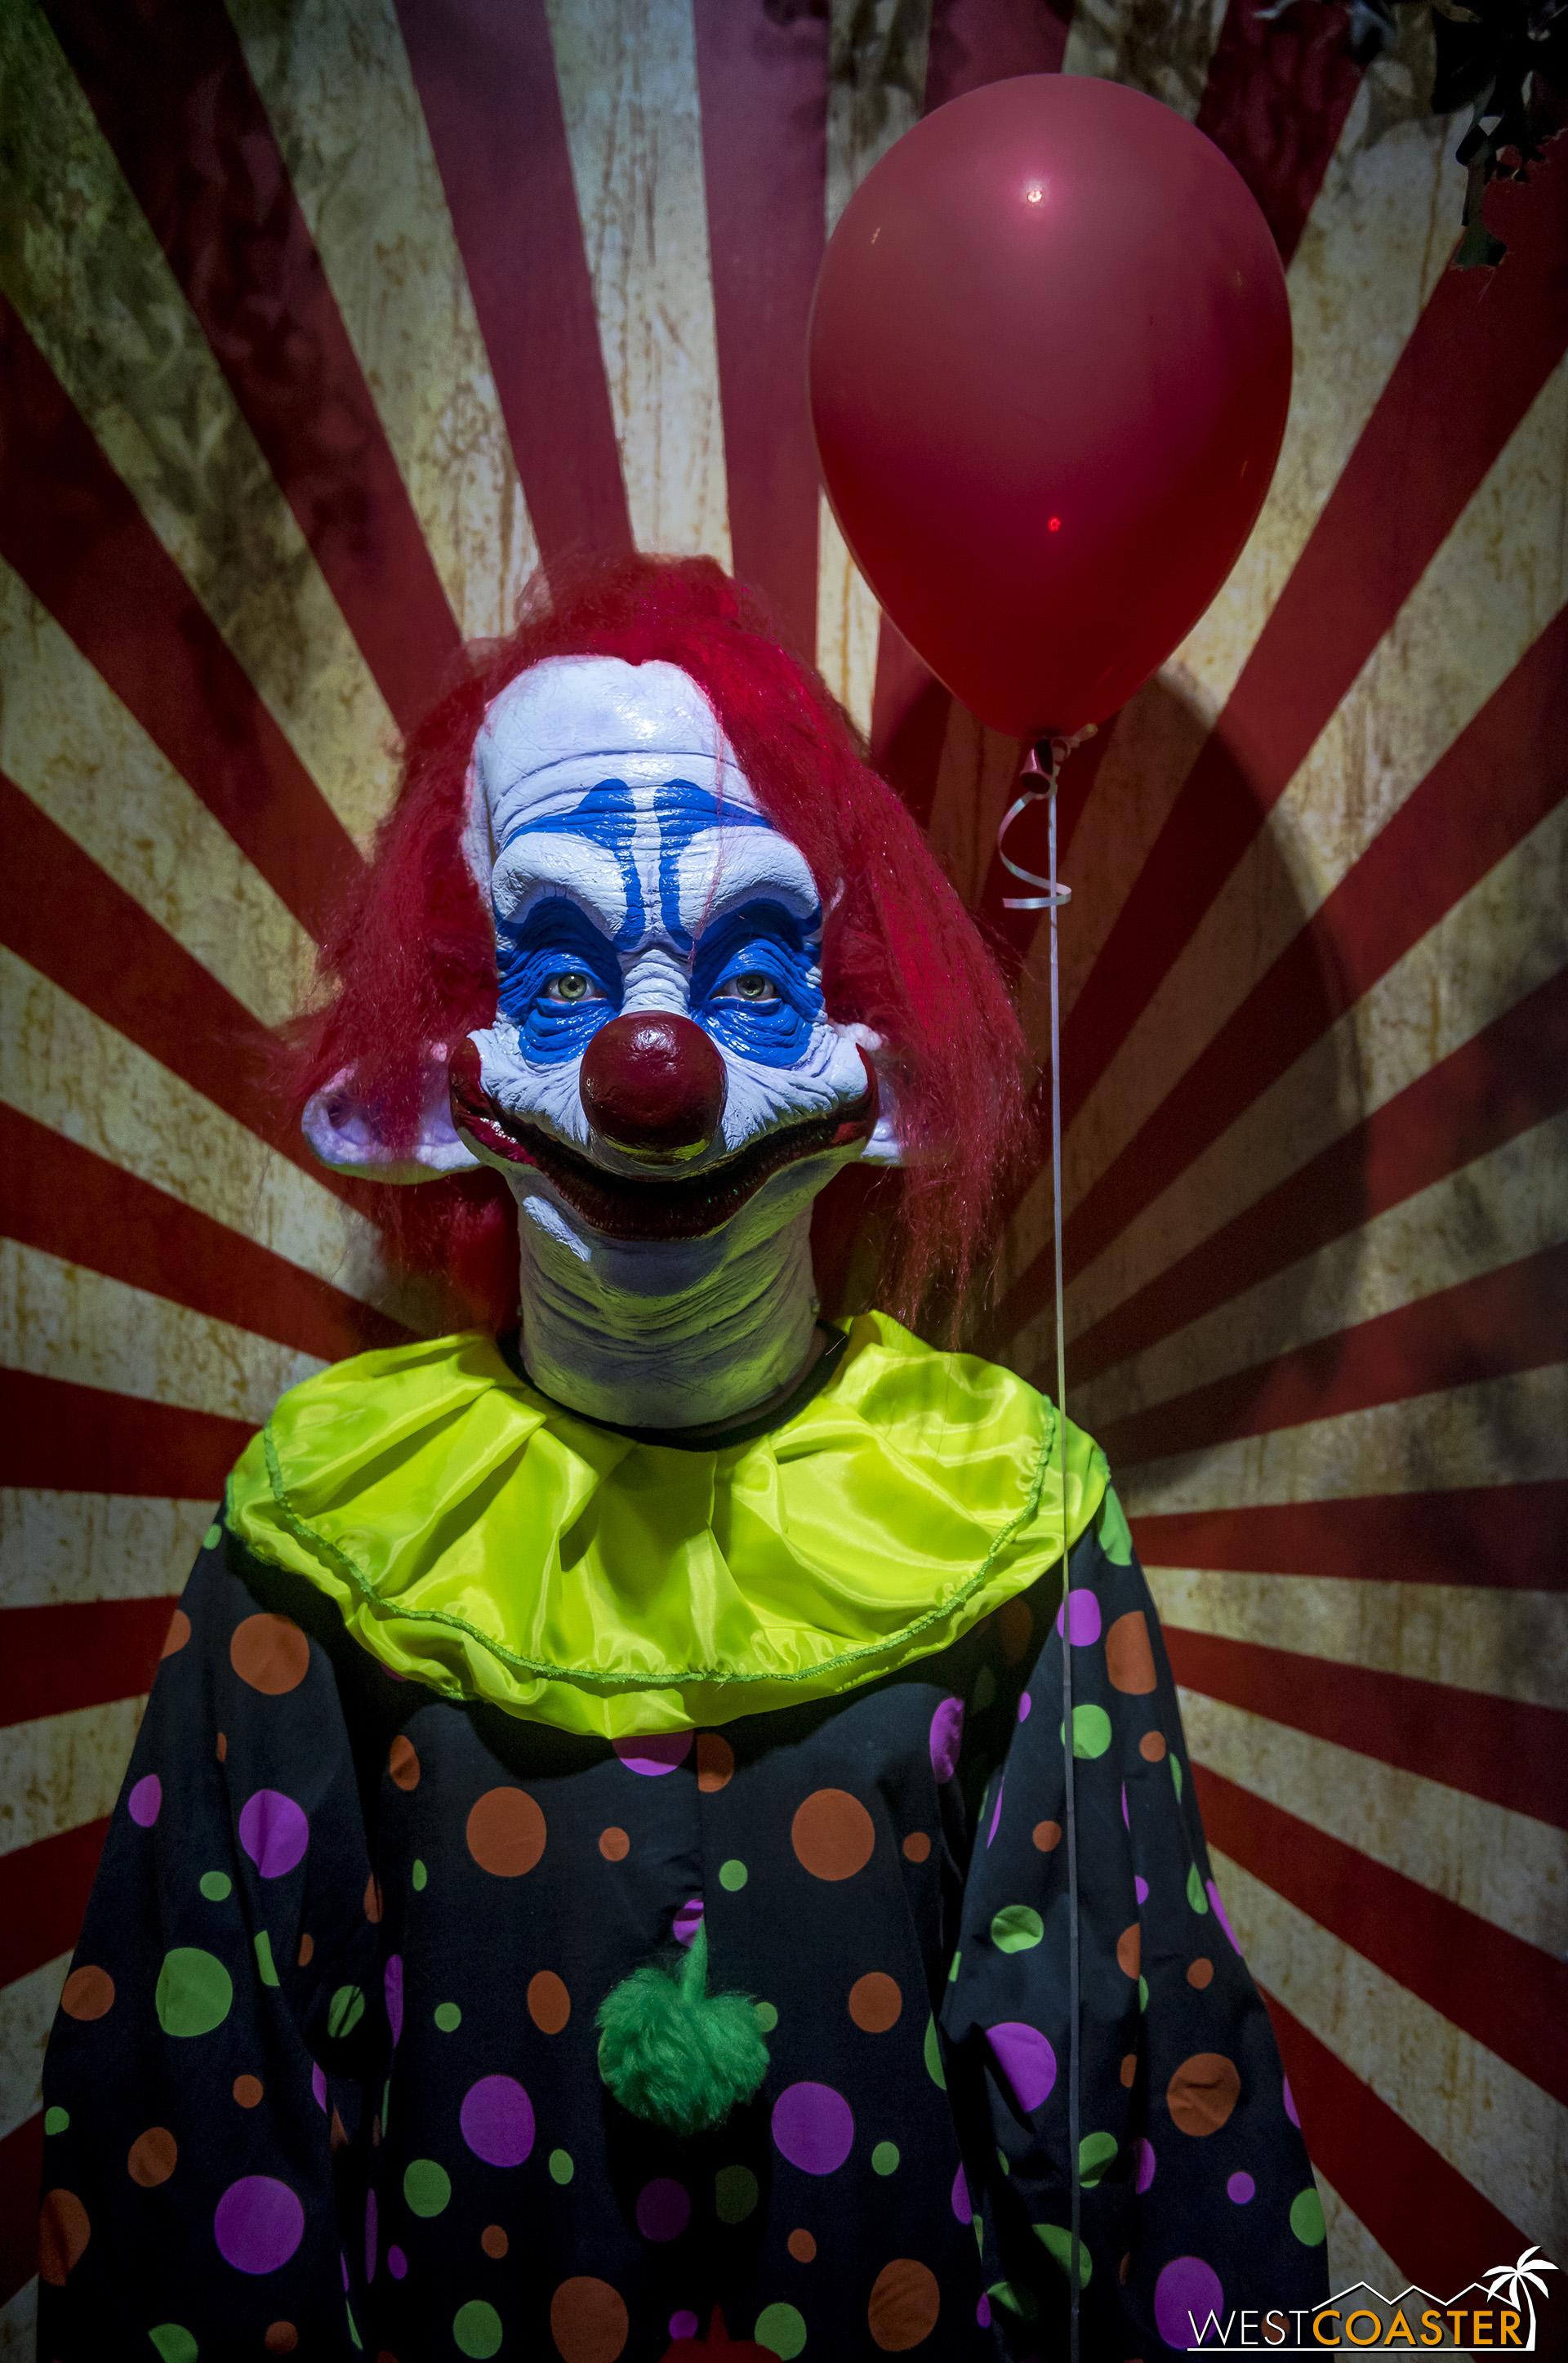 Want to clown around?